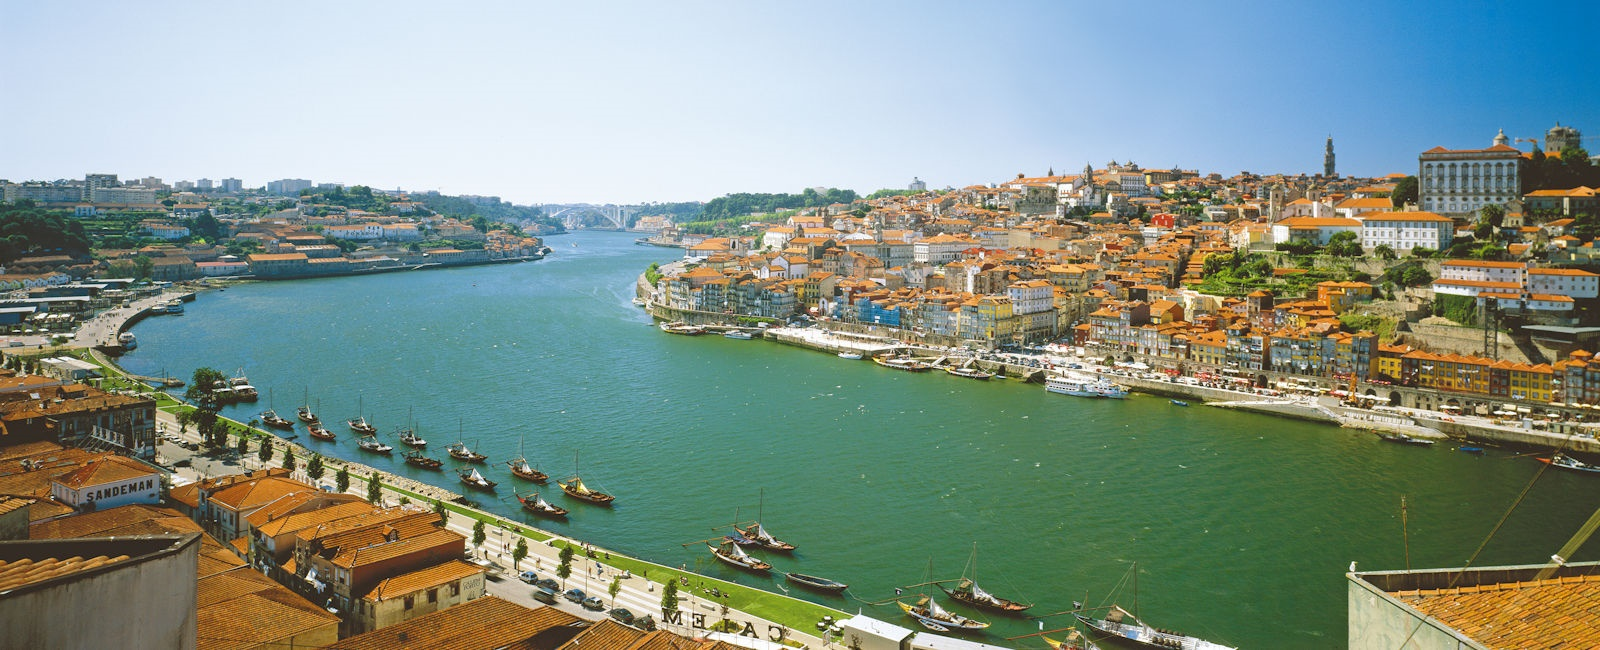 Porto main image